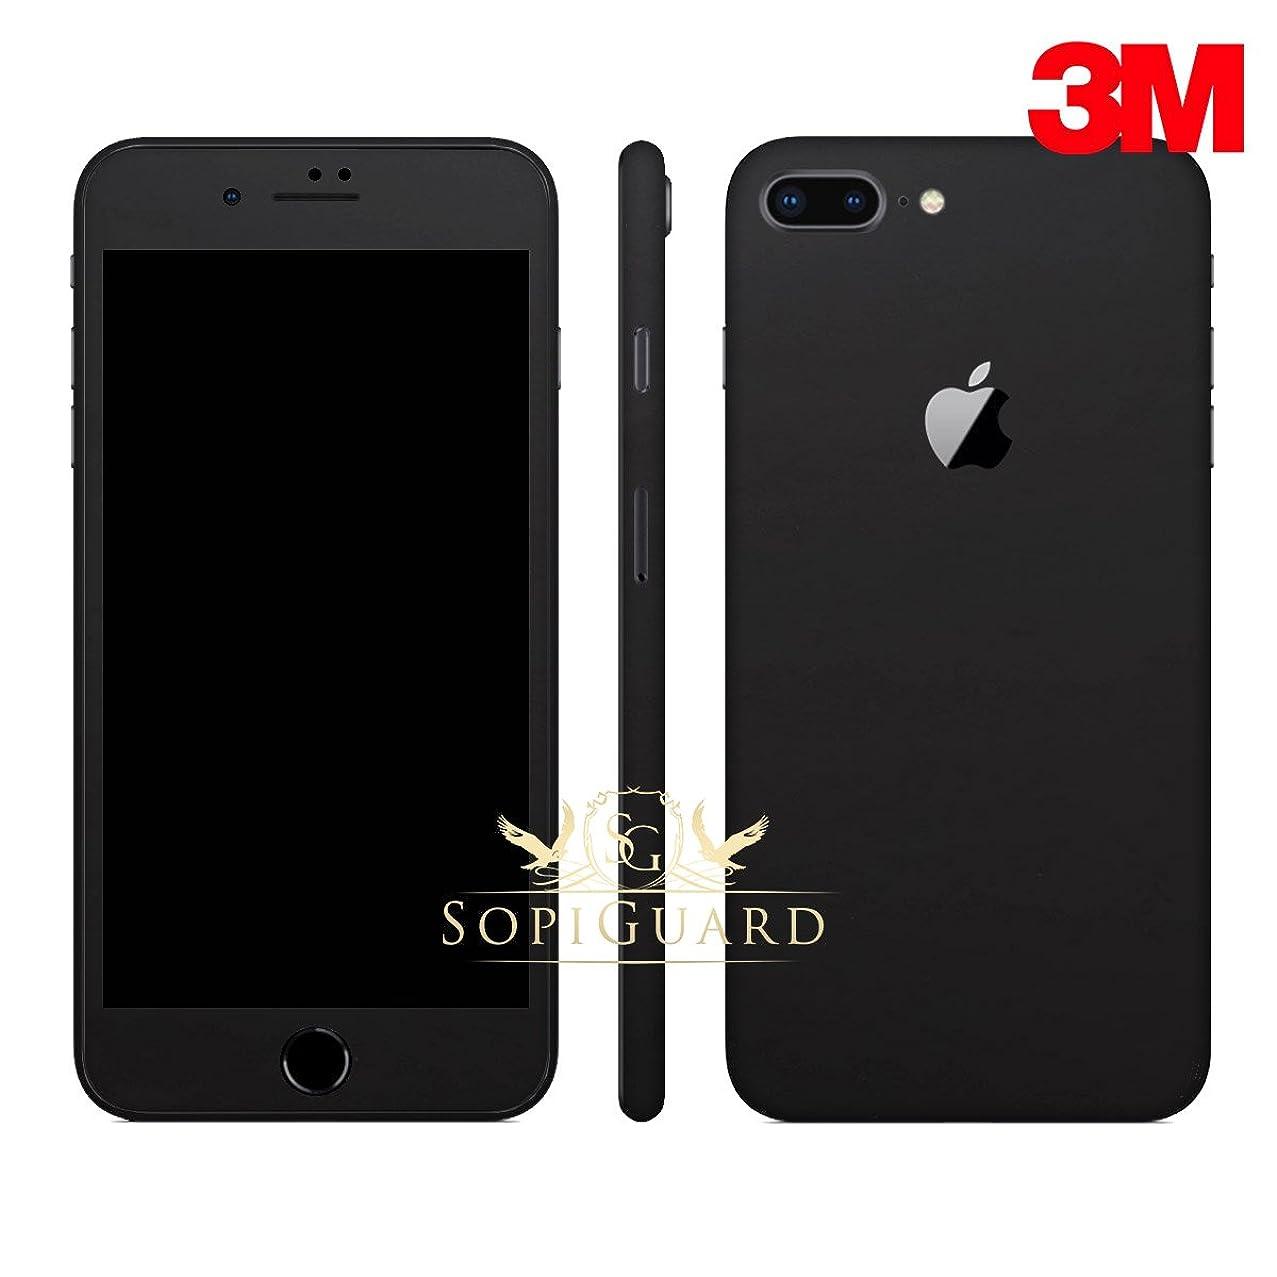 SopiGuard Carbon Fiber Full Body Precision Edge-to-Edge Coverage Easy-to-Apply Vinyl Skin Sticker for iPhone 8 Plus (3M Matte Black)